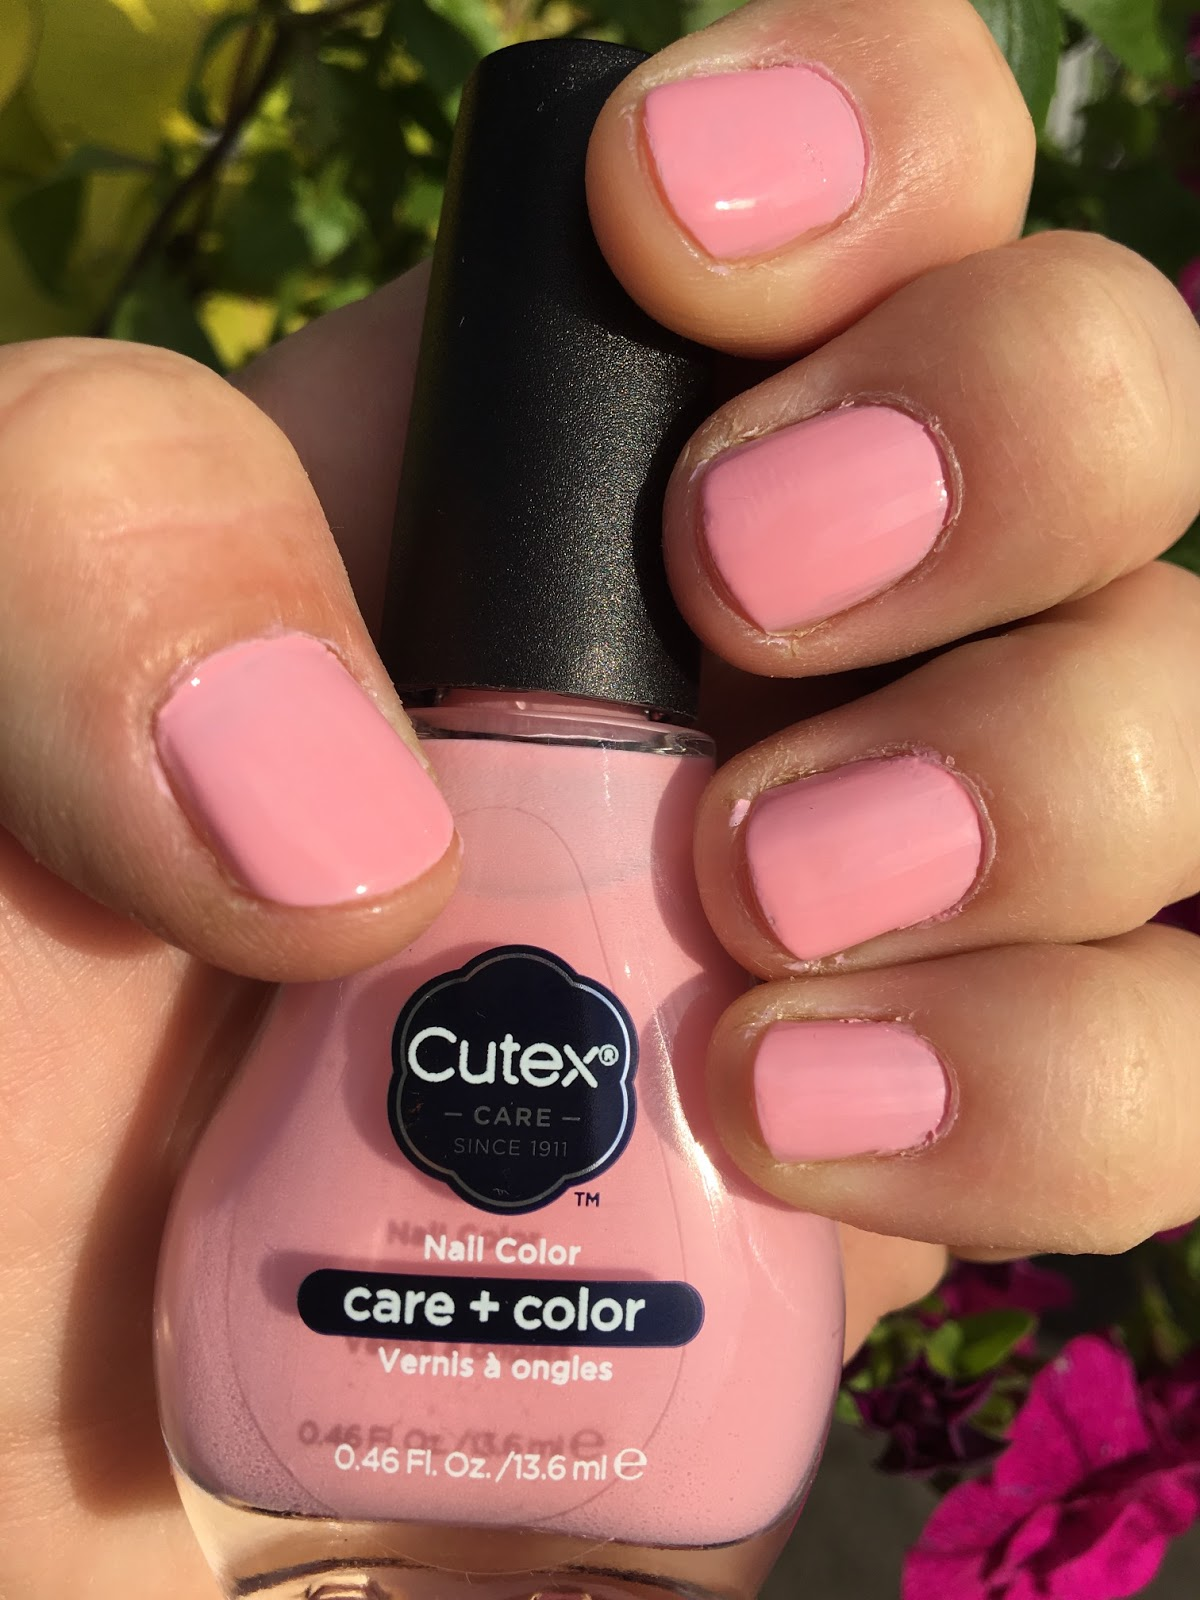 Health & Lifestyle Management : Cutex Summer Nails